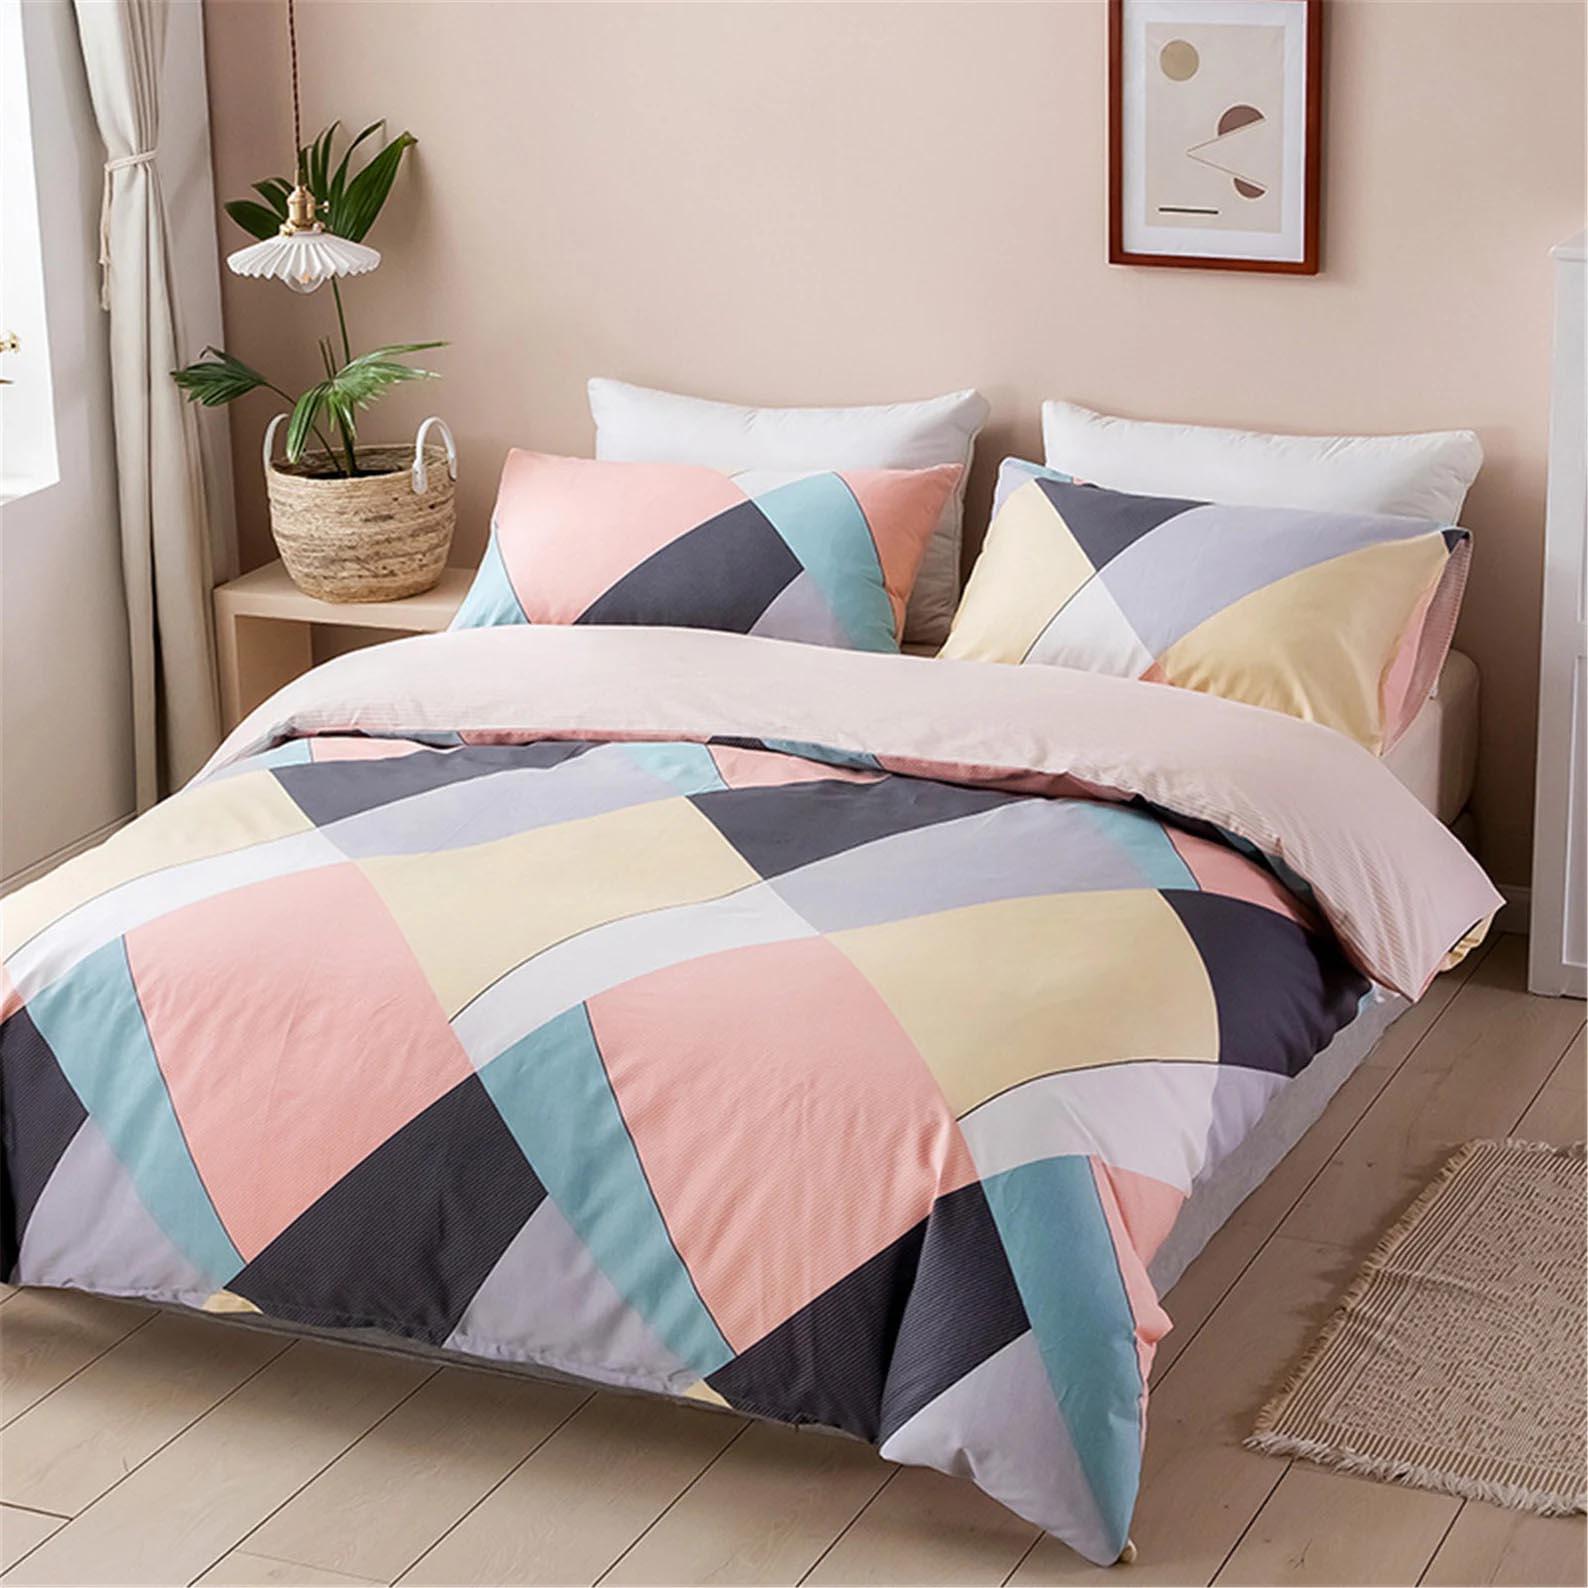 Modern Bedroom Decor - Pastel geometric bedding.